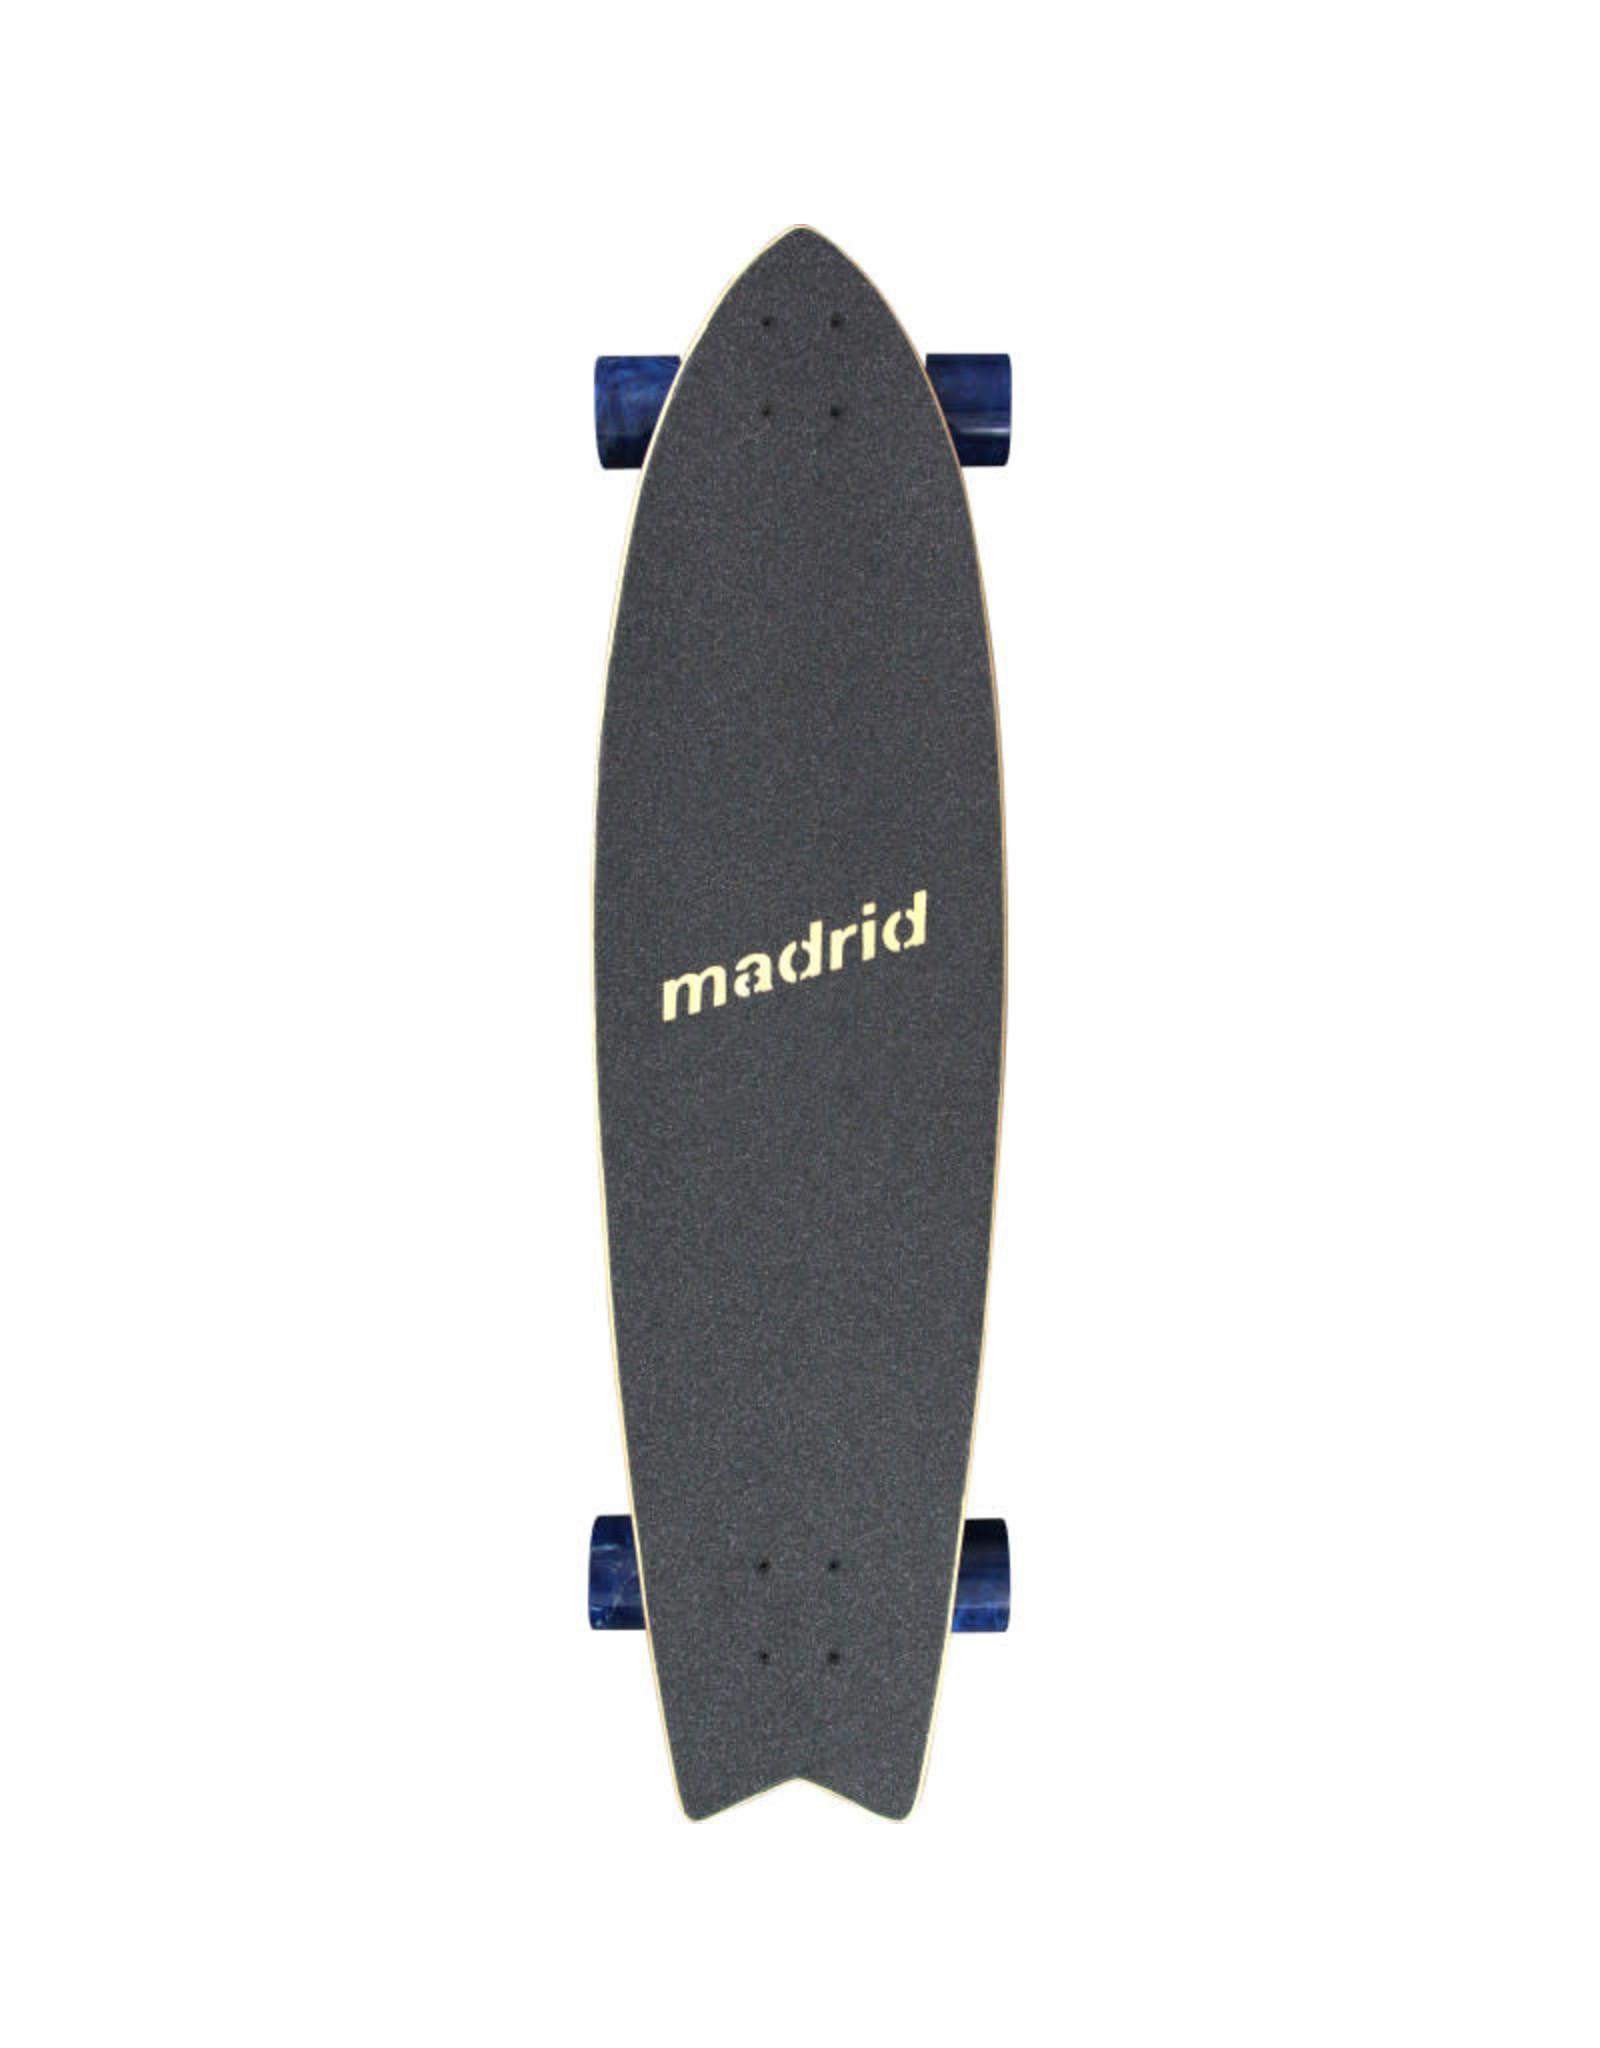 "Madrid Madrid Gun 37.75"" Flutter Longboard Complete"